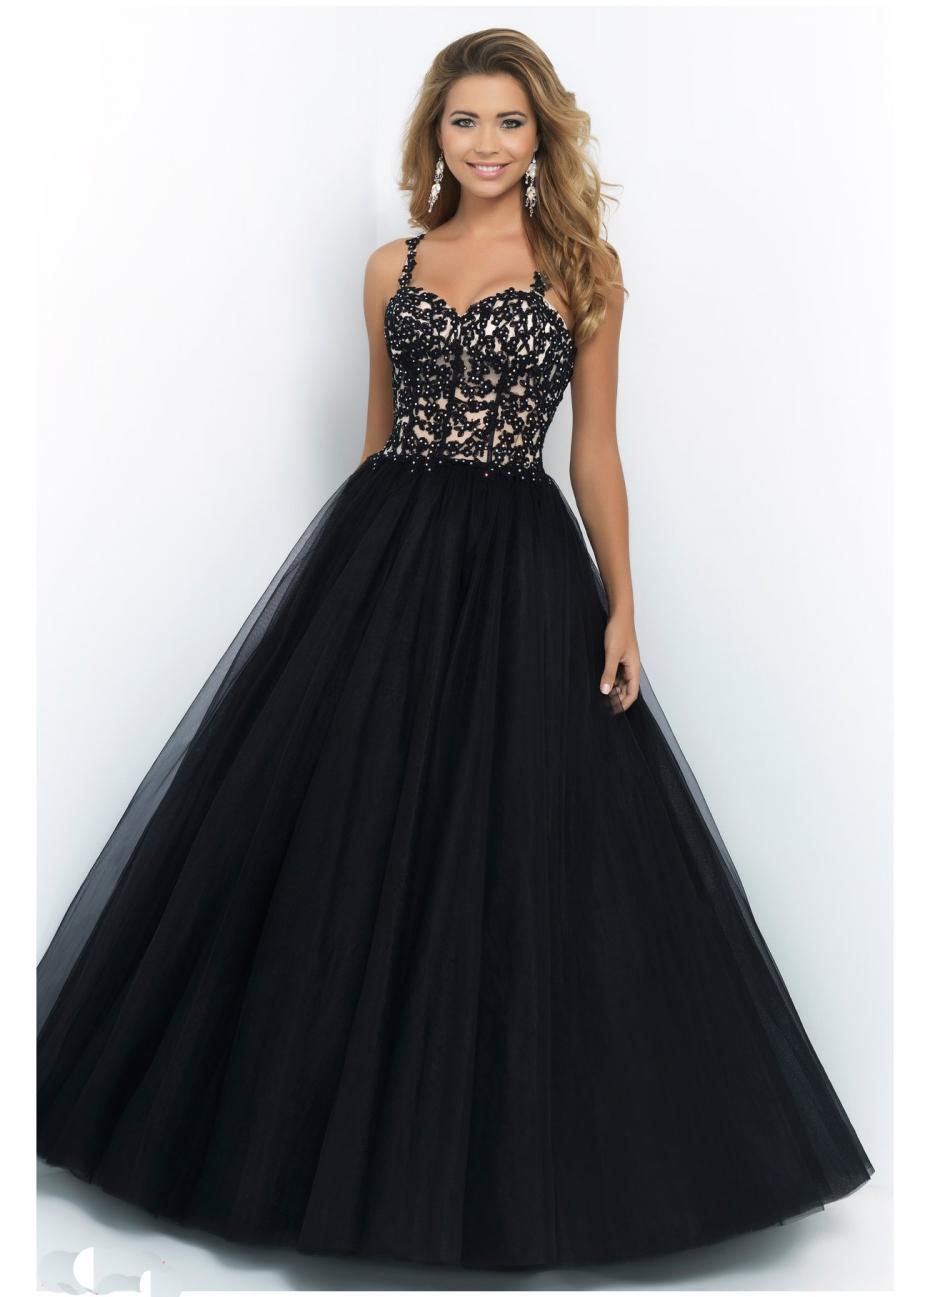 Popular Fluffy Prom Dresses-Buy Cheap Fluffy Prom Dresses ...